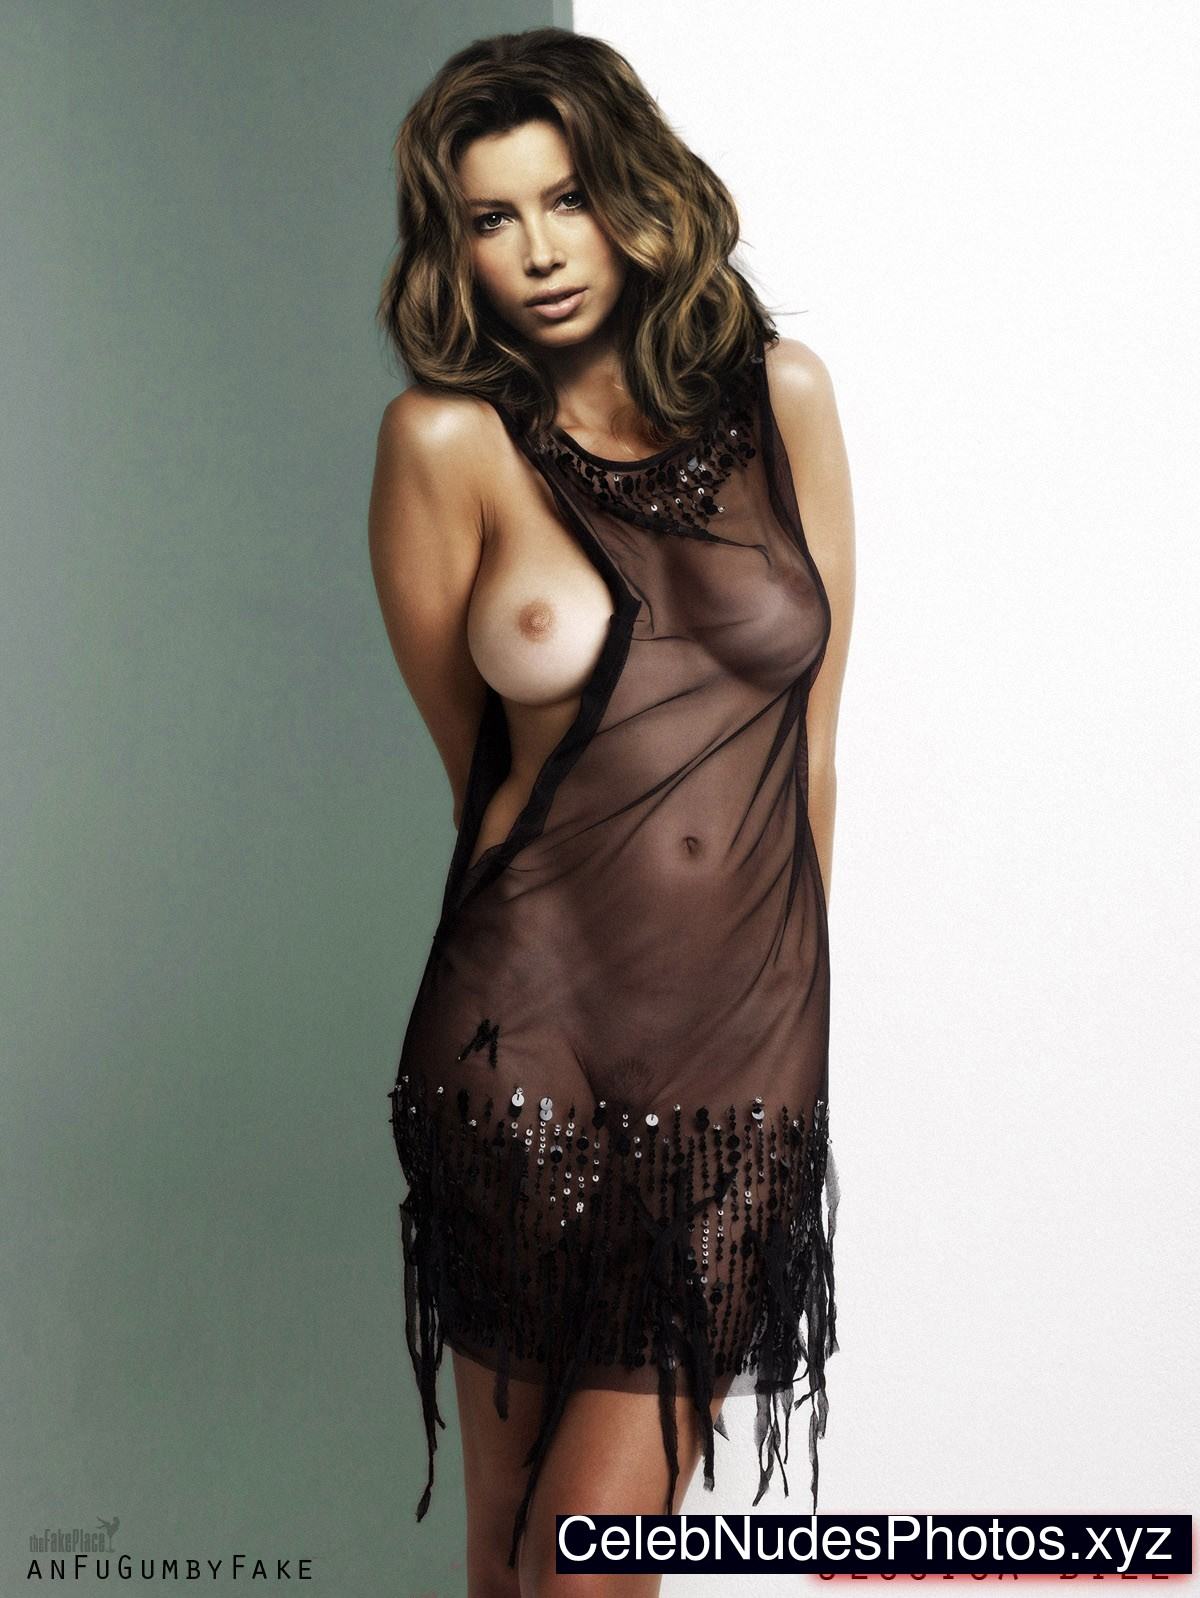 Jessica Biel celebrity naked pics